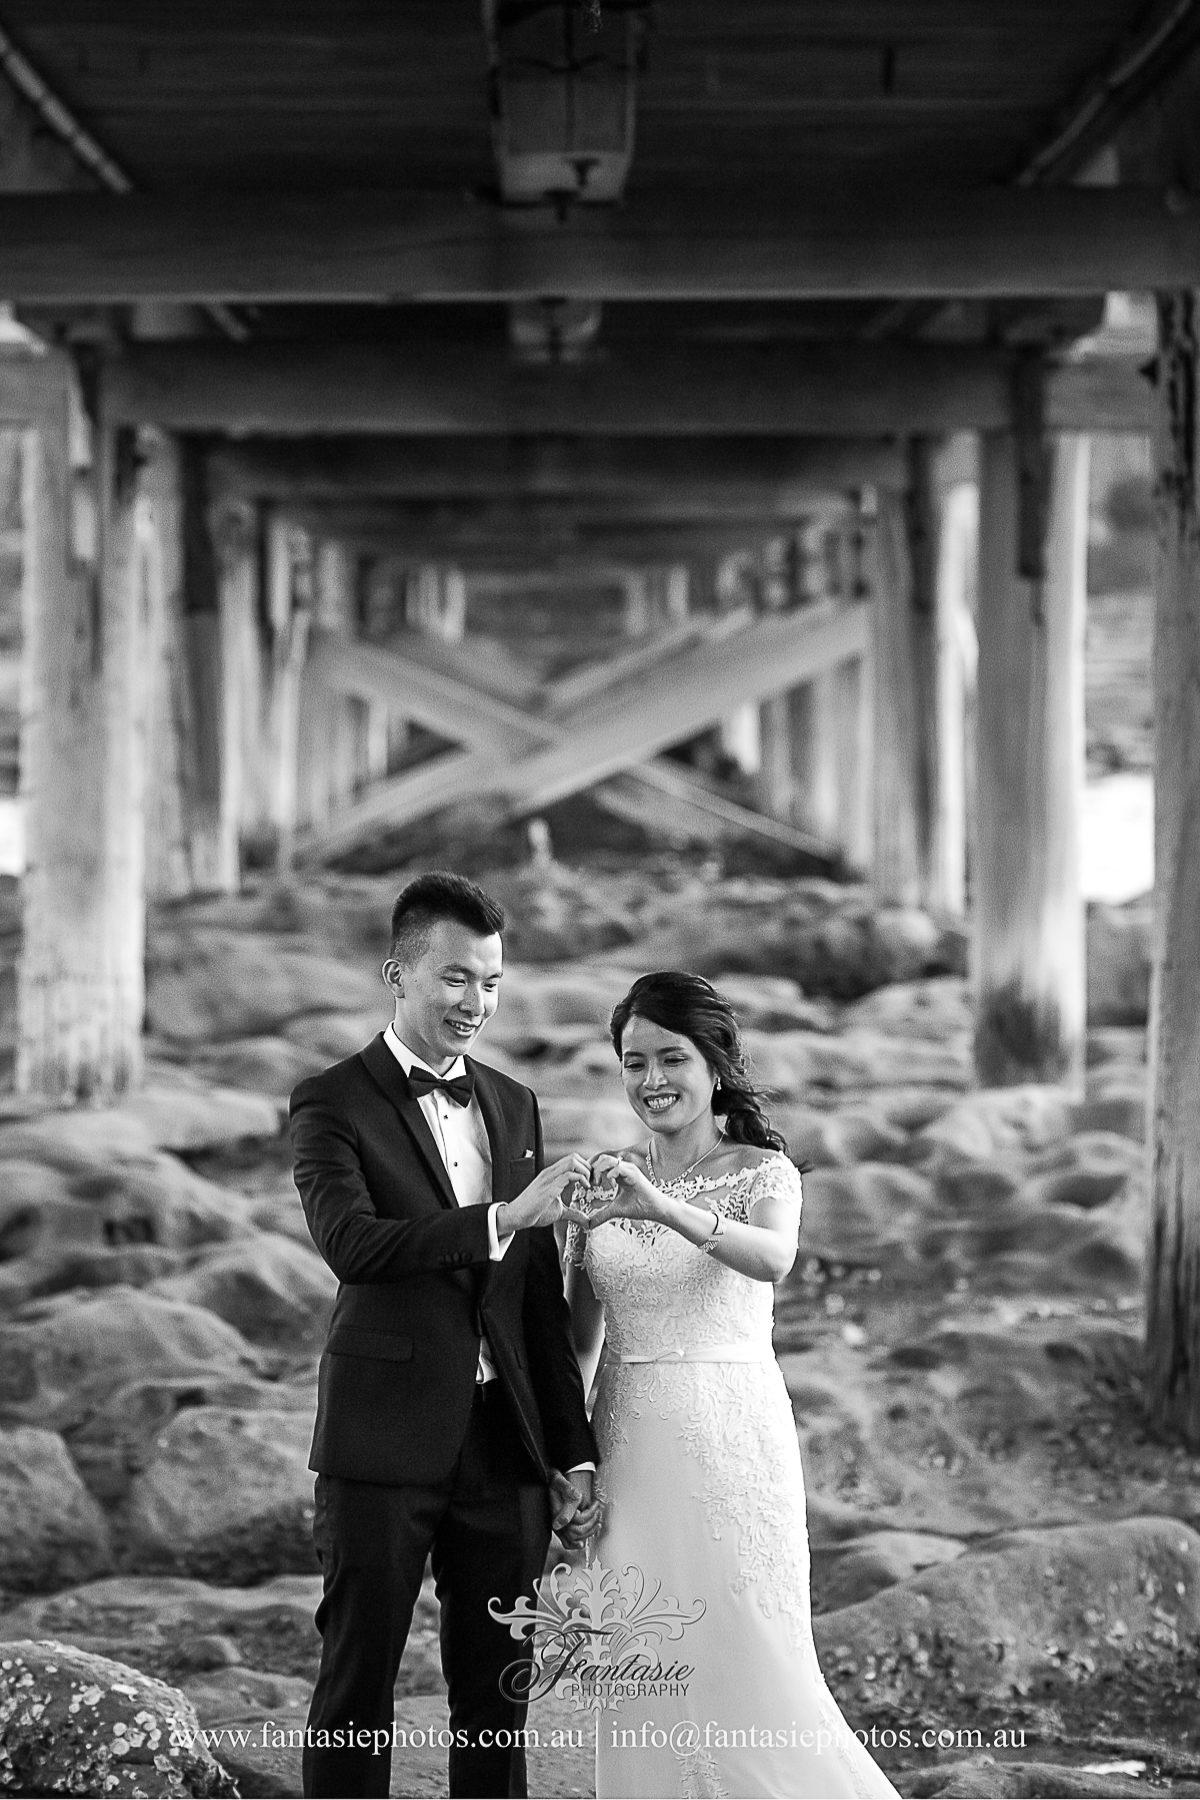 Wedding Photography La Perouse | Fantasie Photography